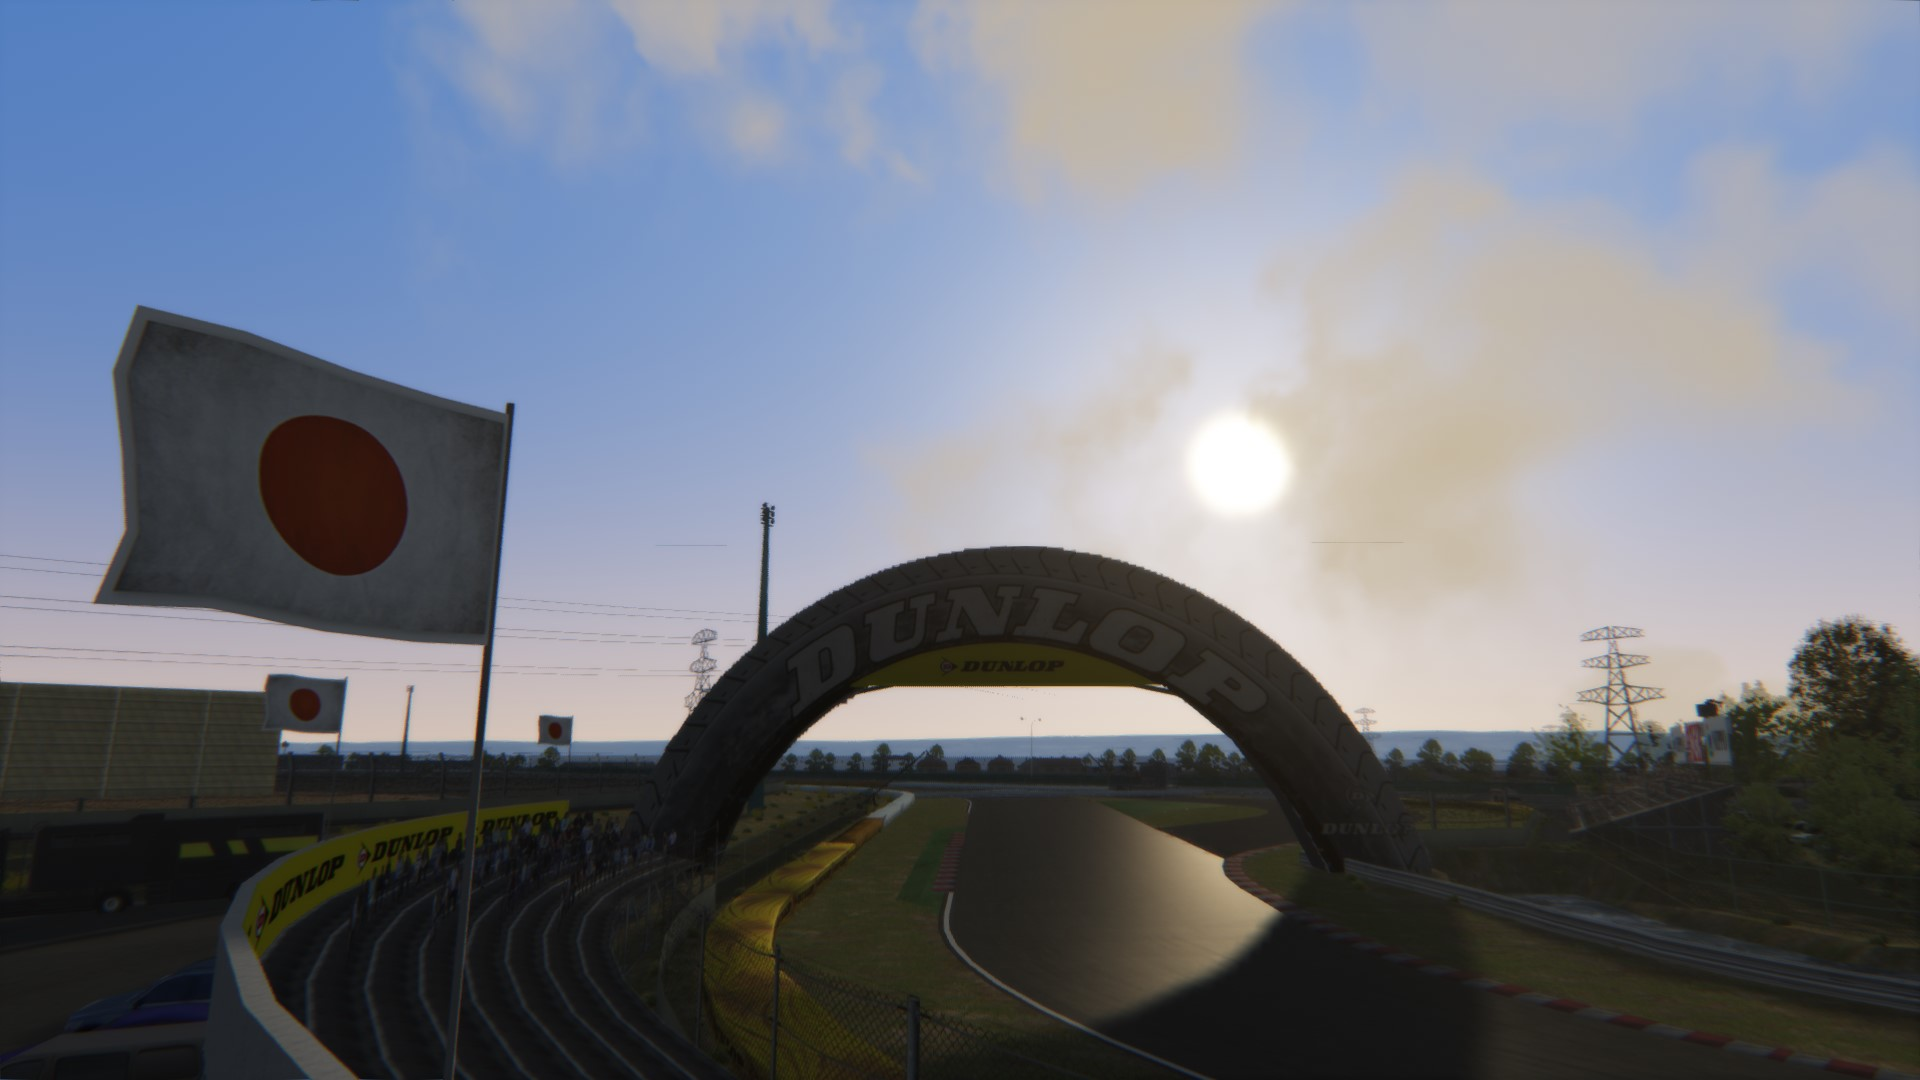 Screenshot_ks_nissan_gtr_tsukuba_circuit_29-3-116-15-27-27.jpg